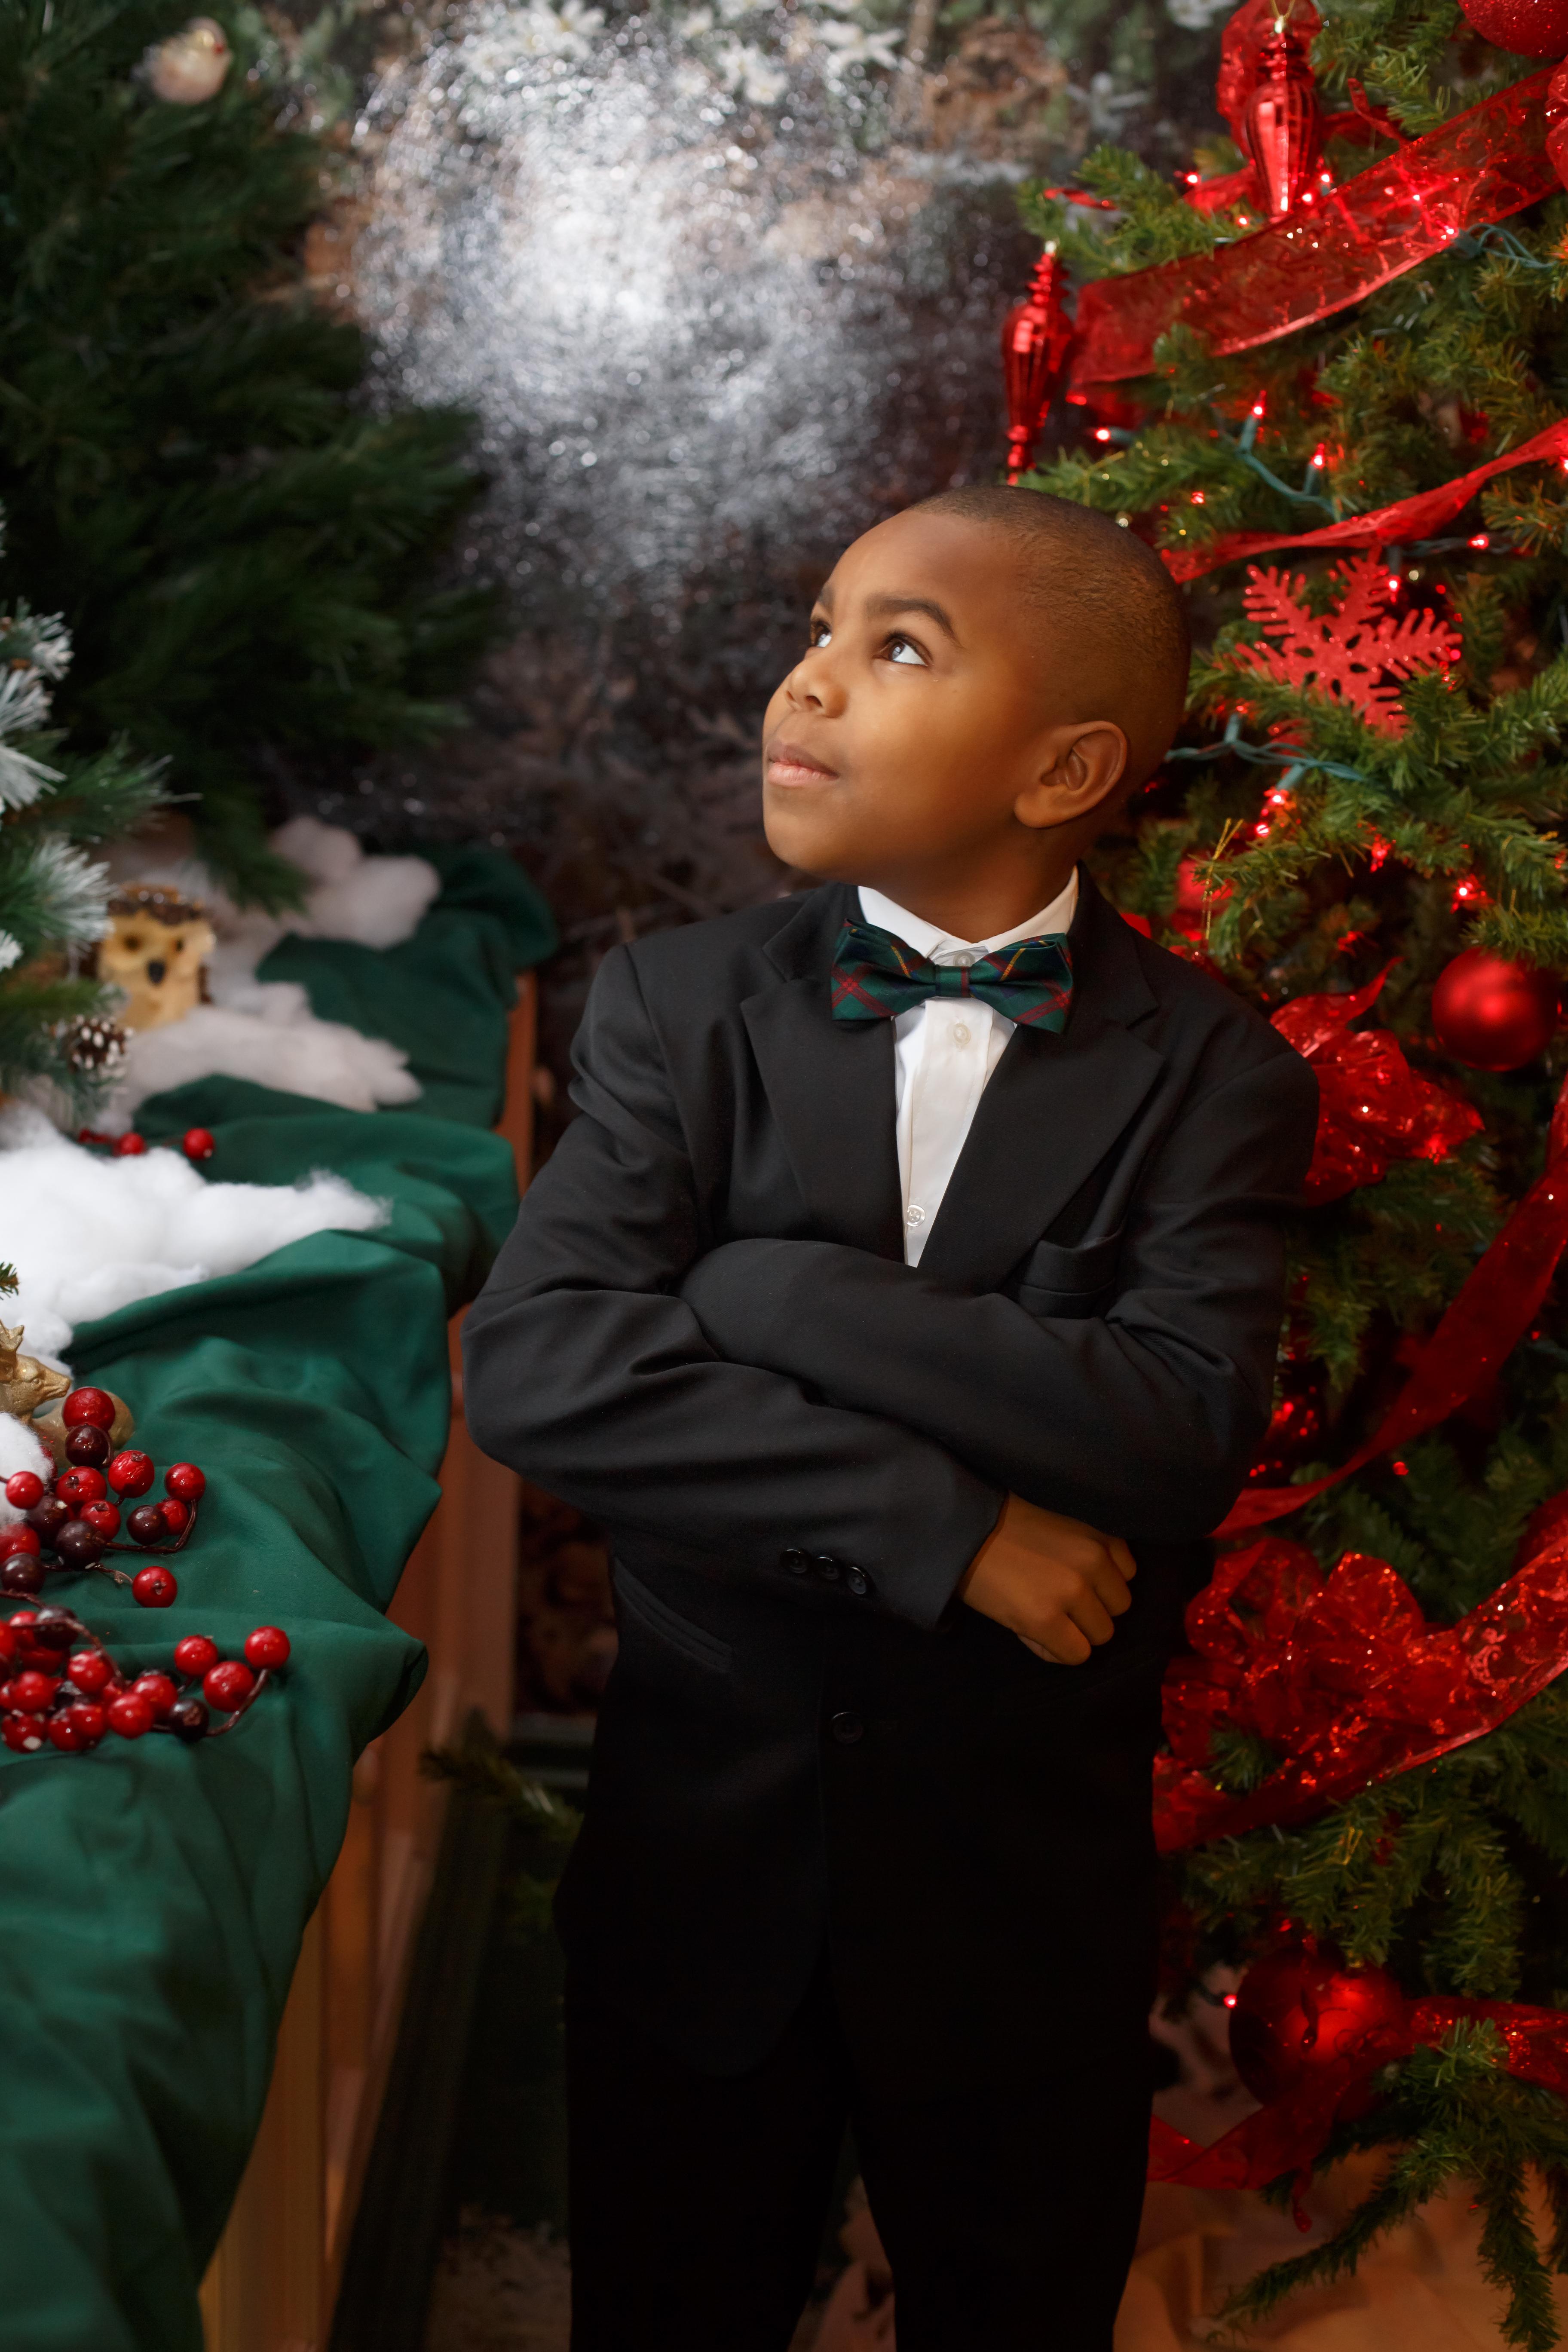 Happy Holidays Toledo! Holiday Portraits Photography